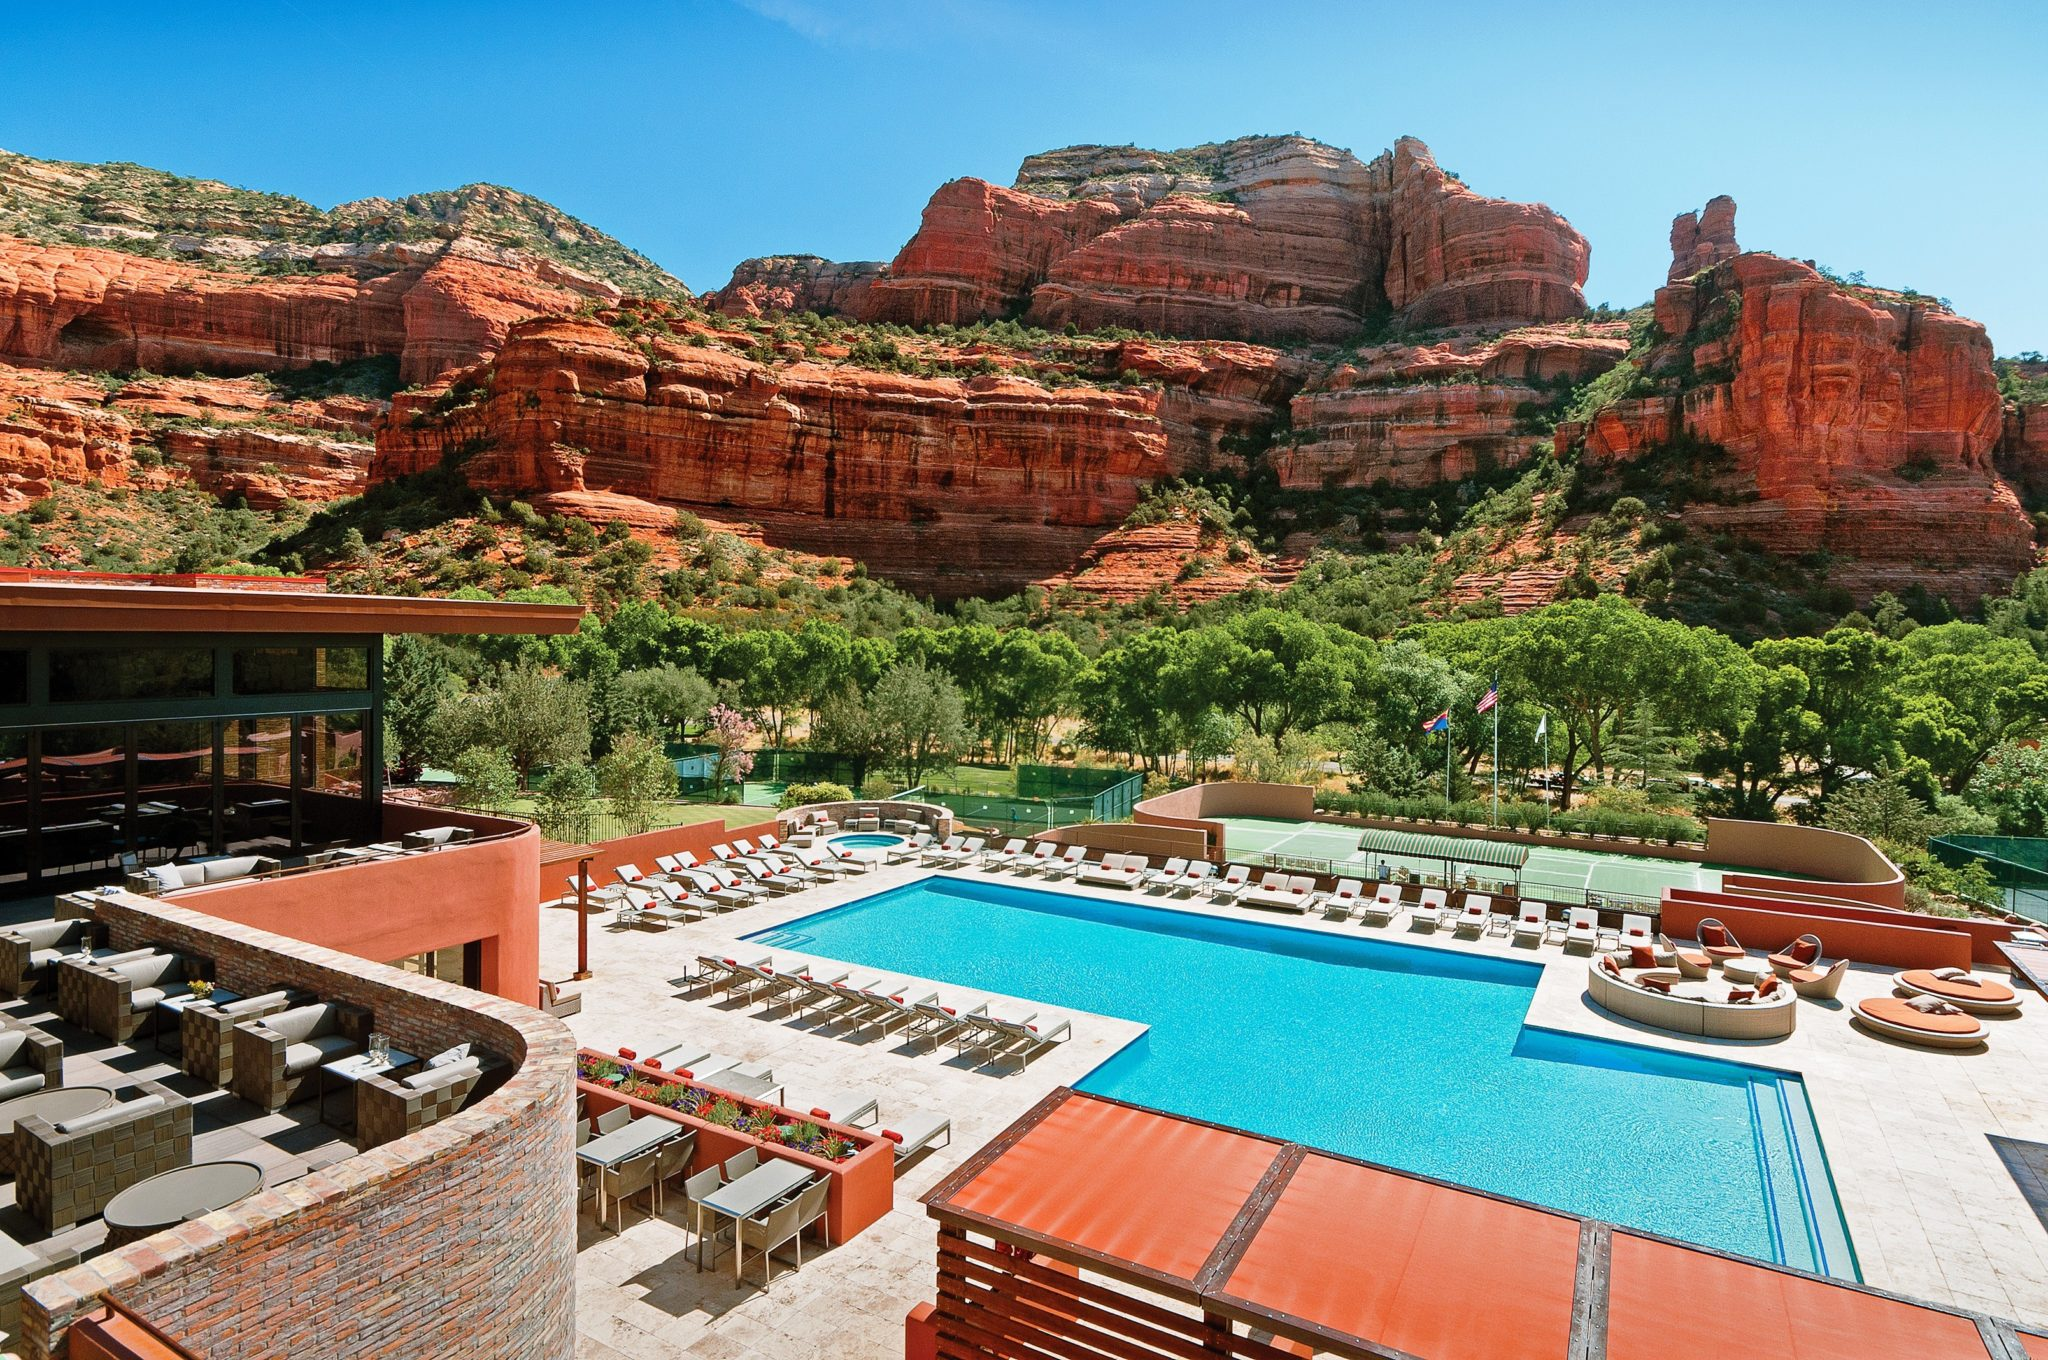 Enchantment Resort | Pool view